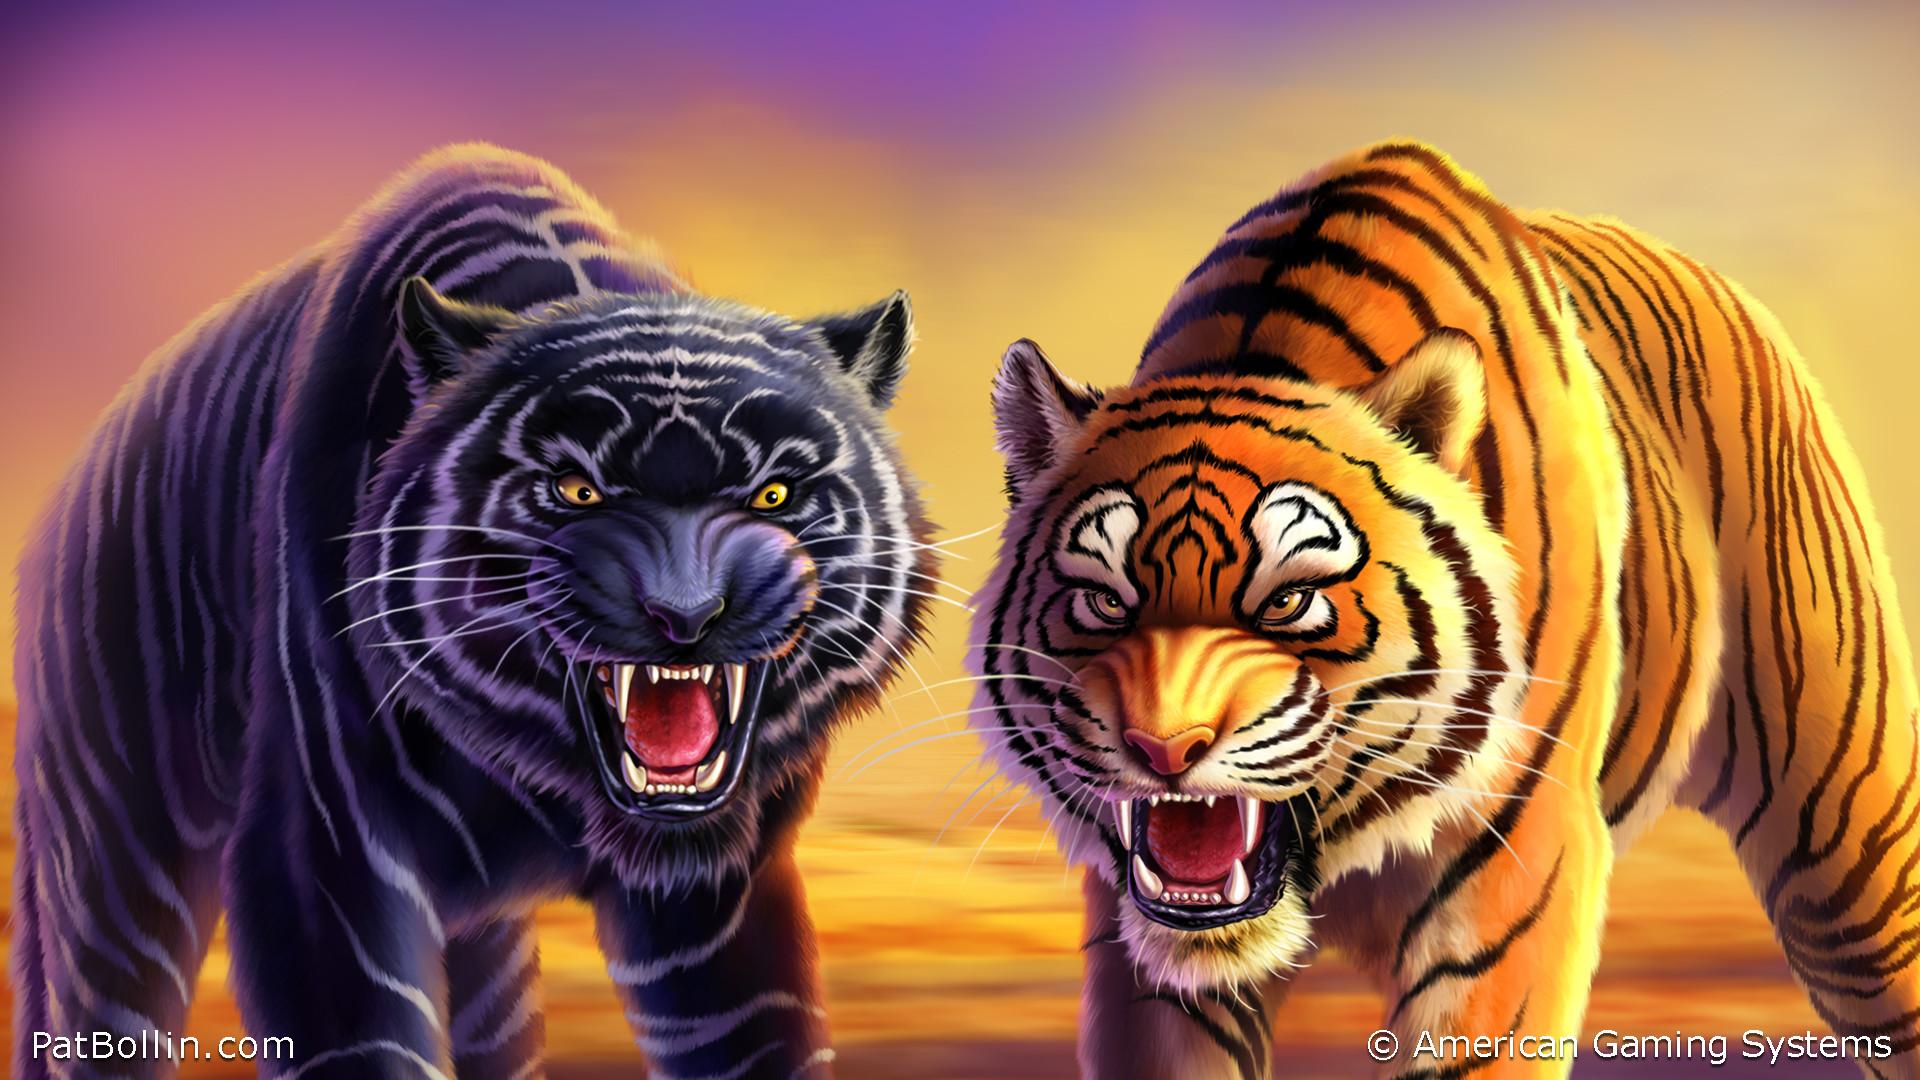 Pat bollin tigertigerbasegame